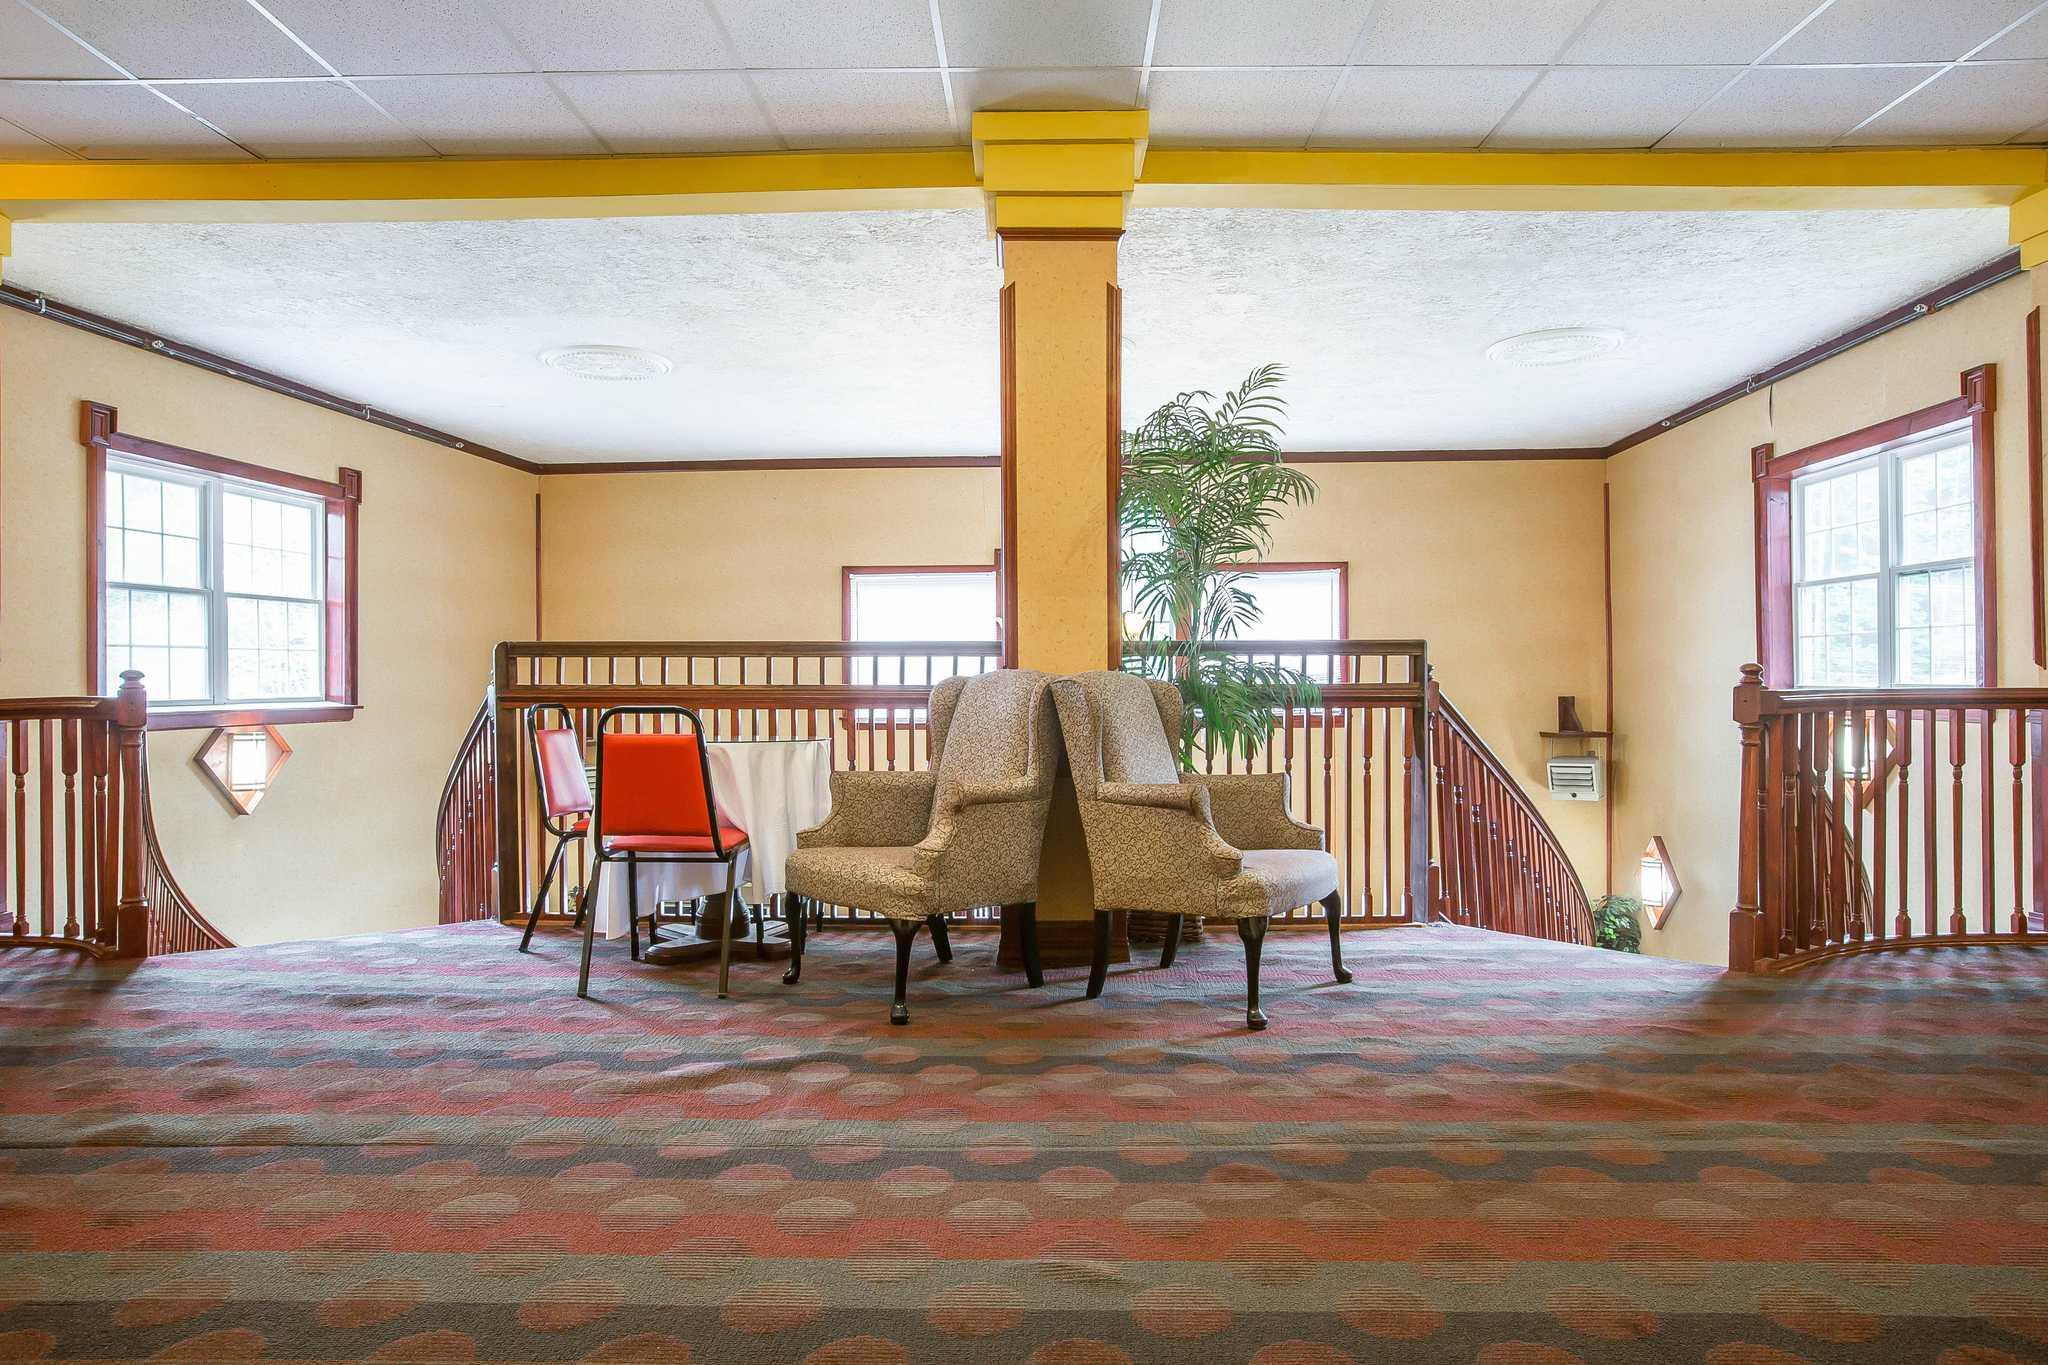 Econo Lodge image 33